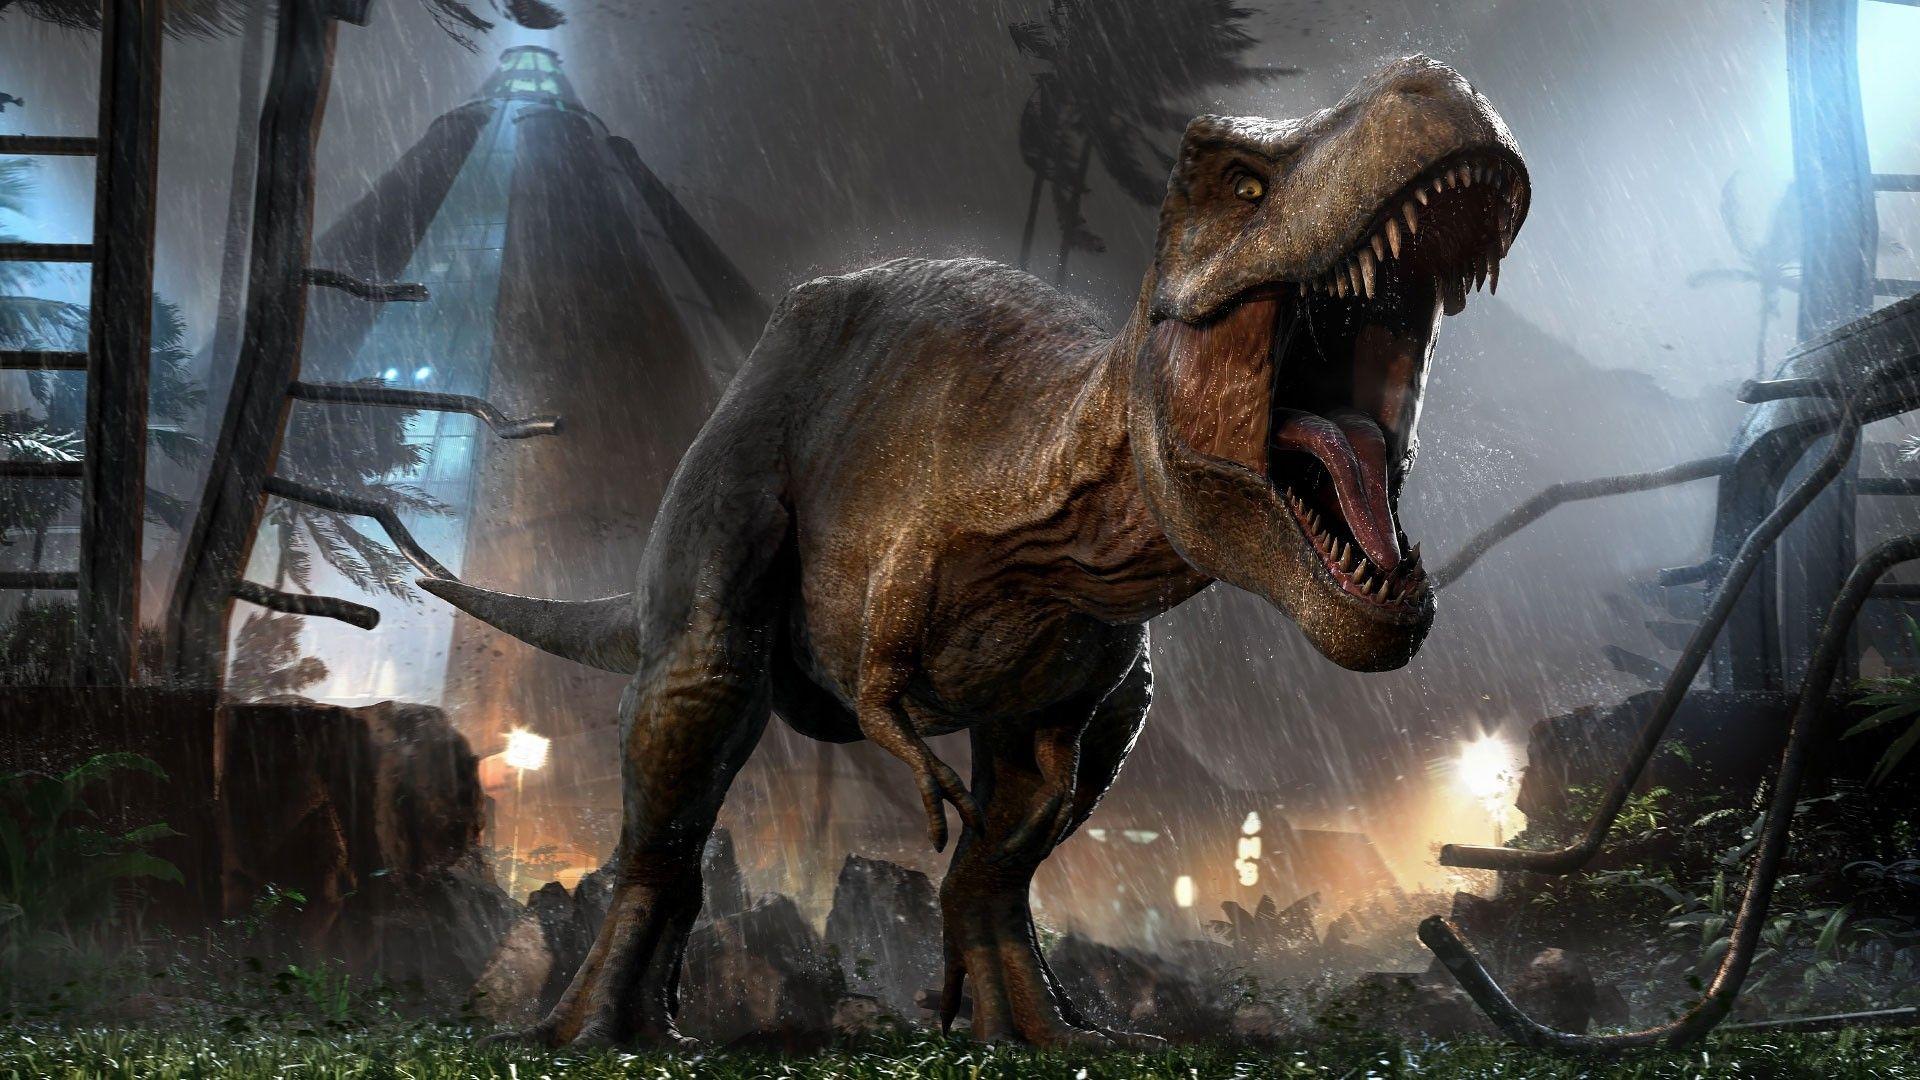 Official T-Rex Wallpaper (1920x1080) | Reddit HD Wallpapers